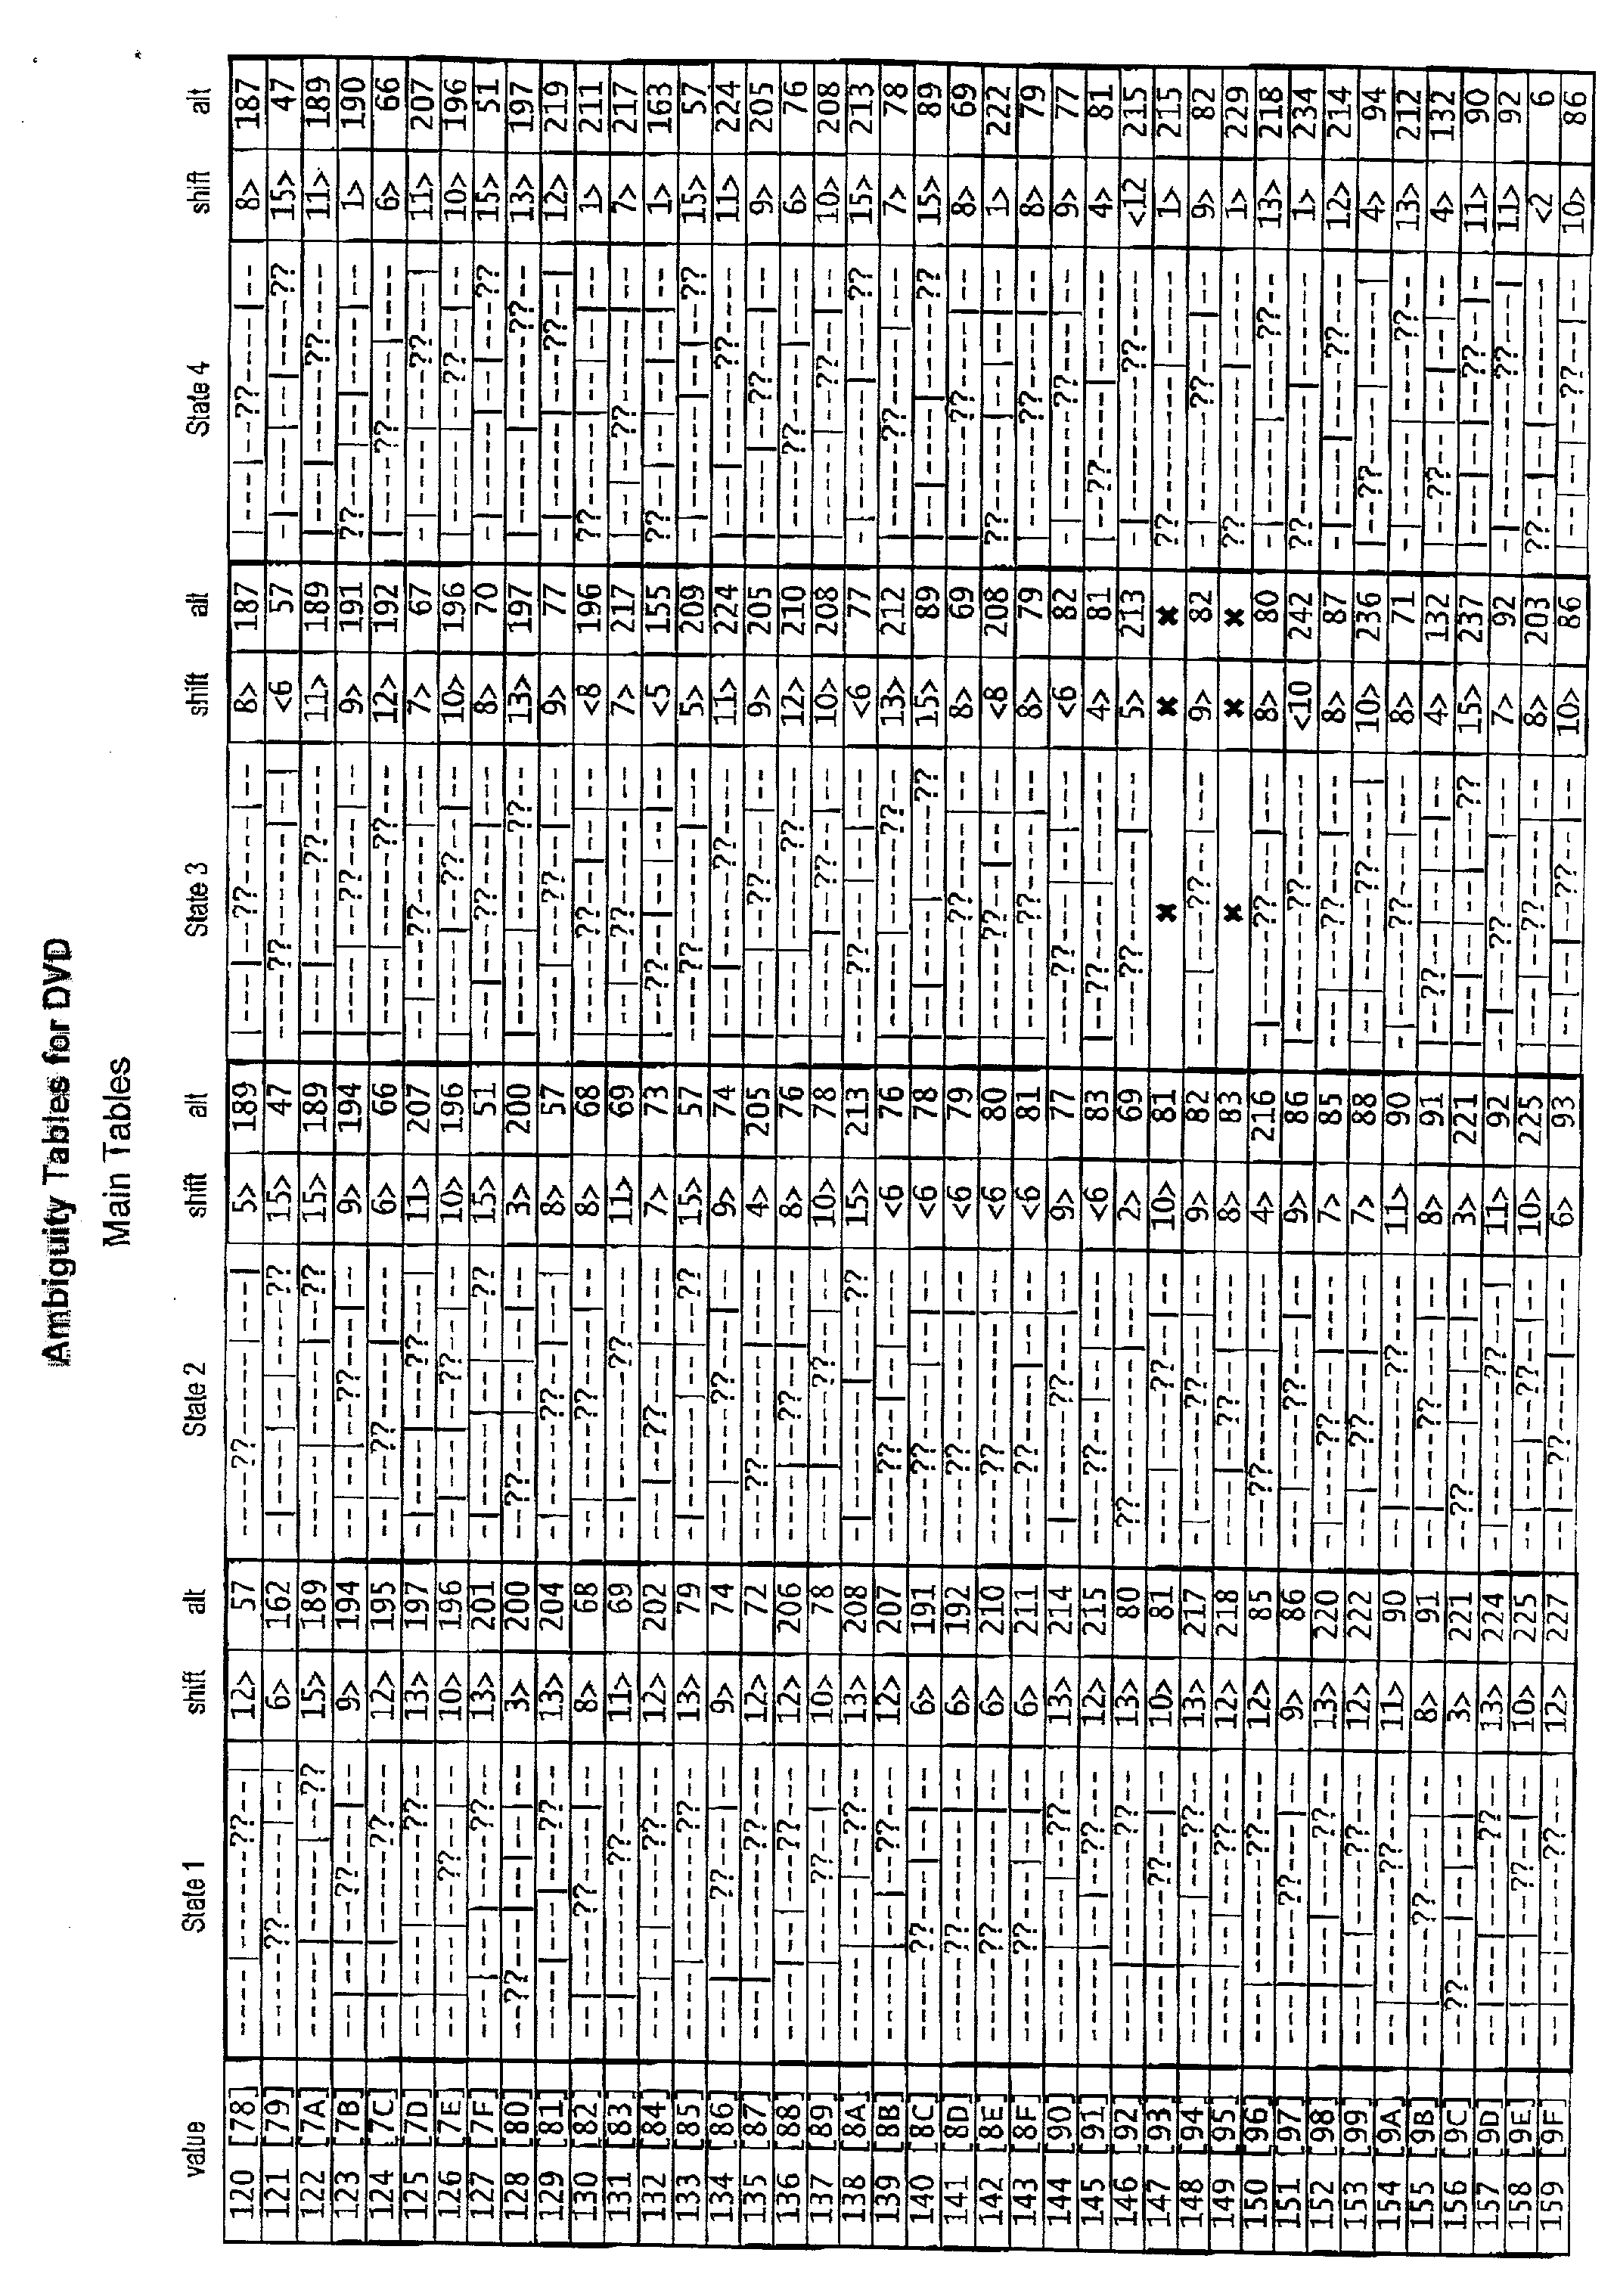 Figure US20020069389A1-20020606-P00005